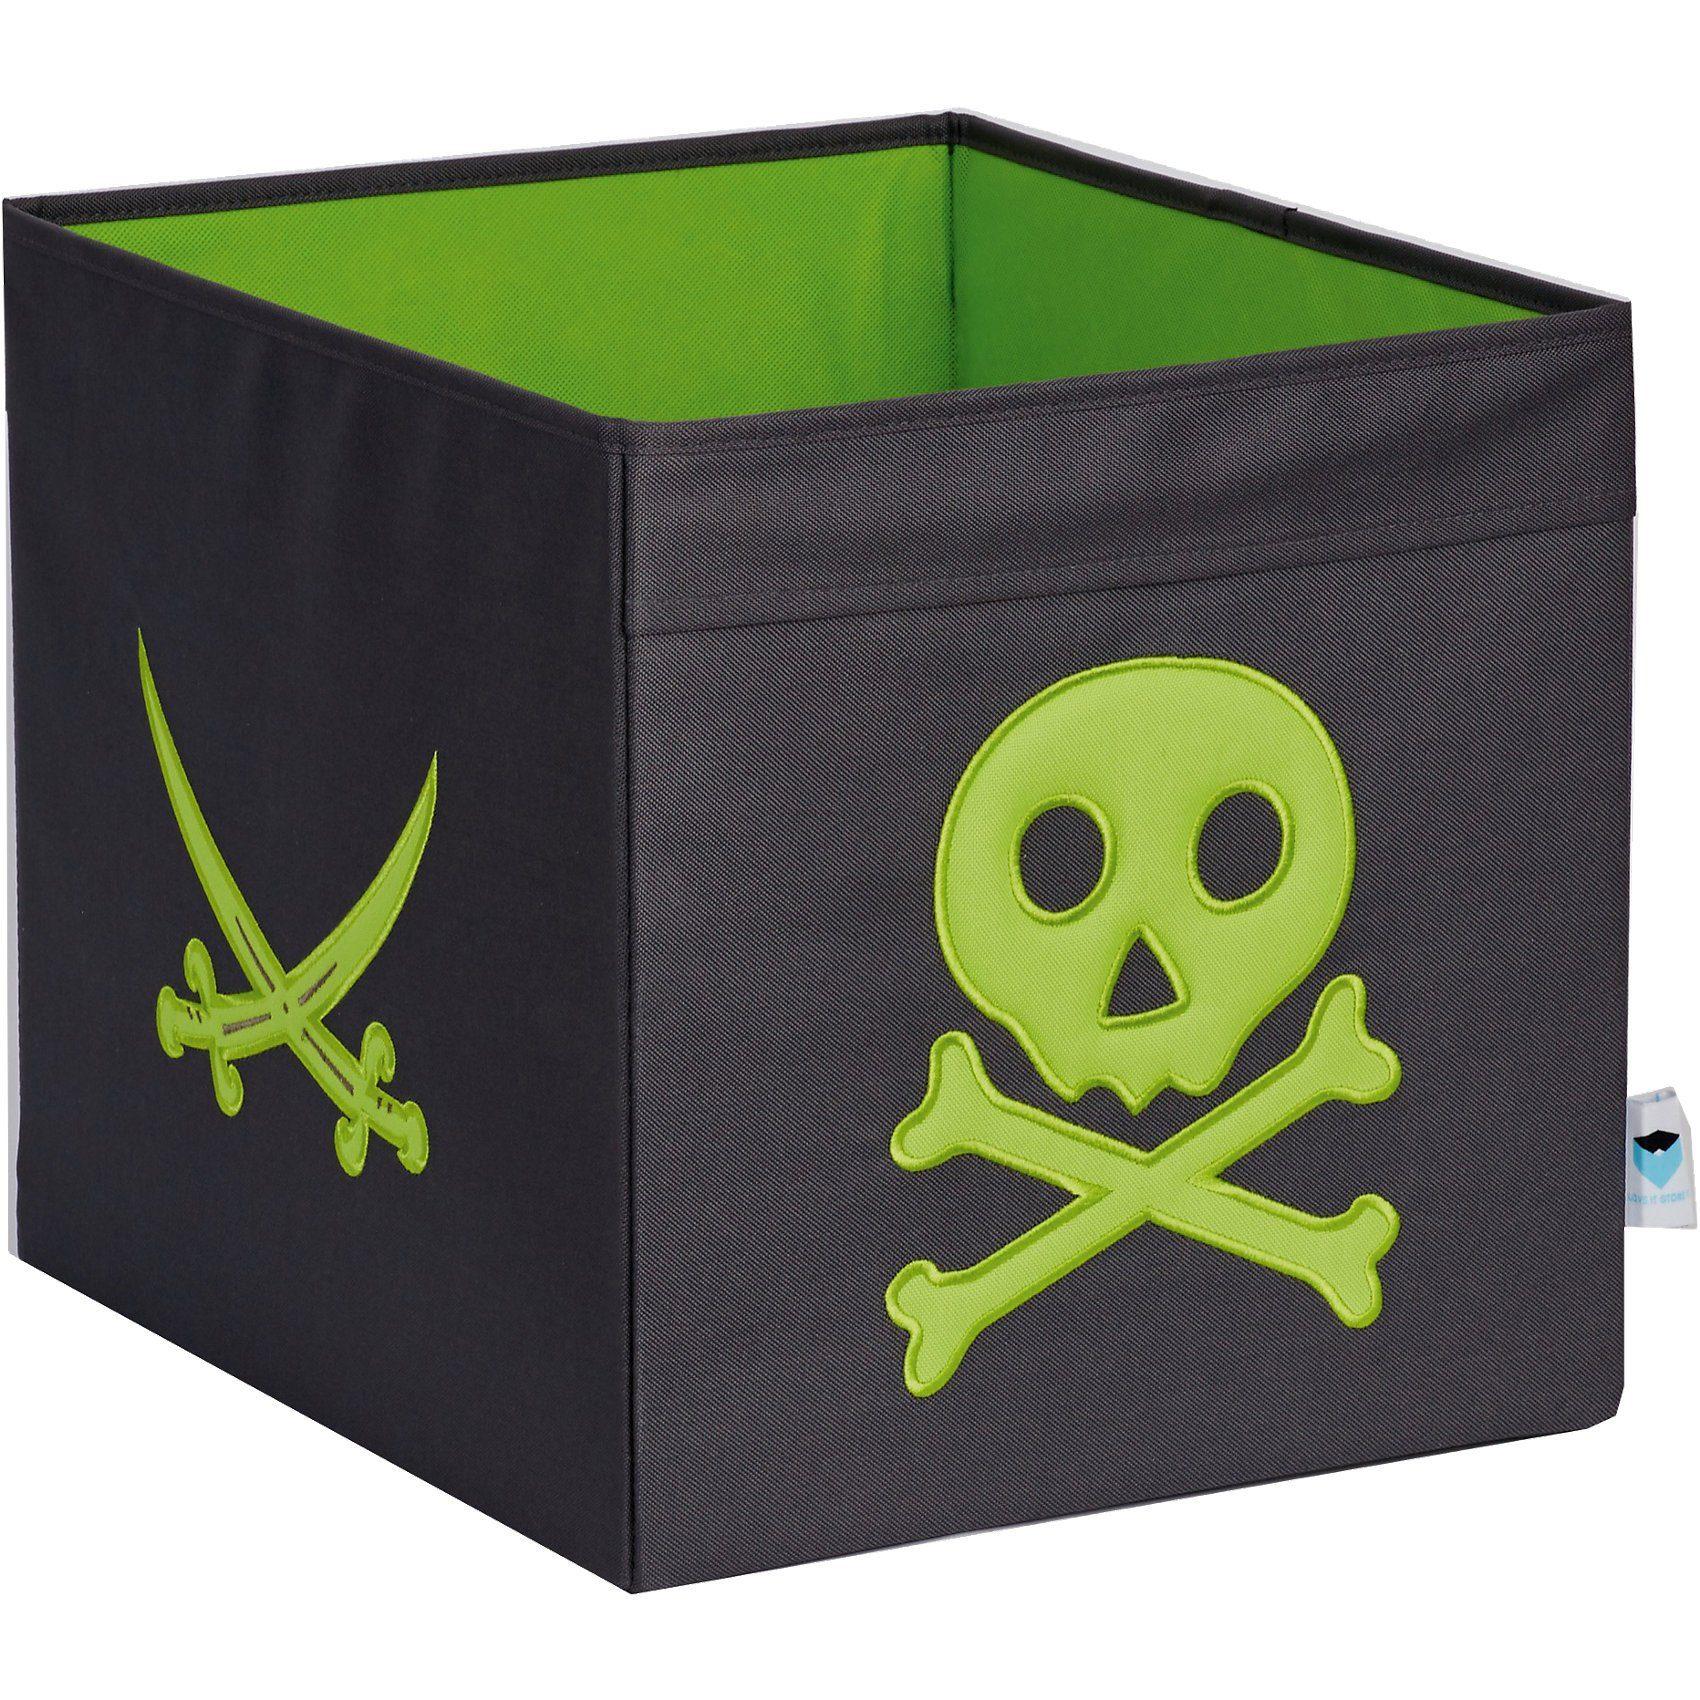 Aufbewahrungsbox Pirat, grau/grün